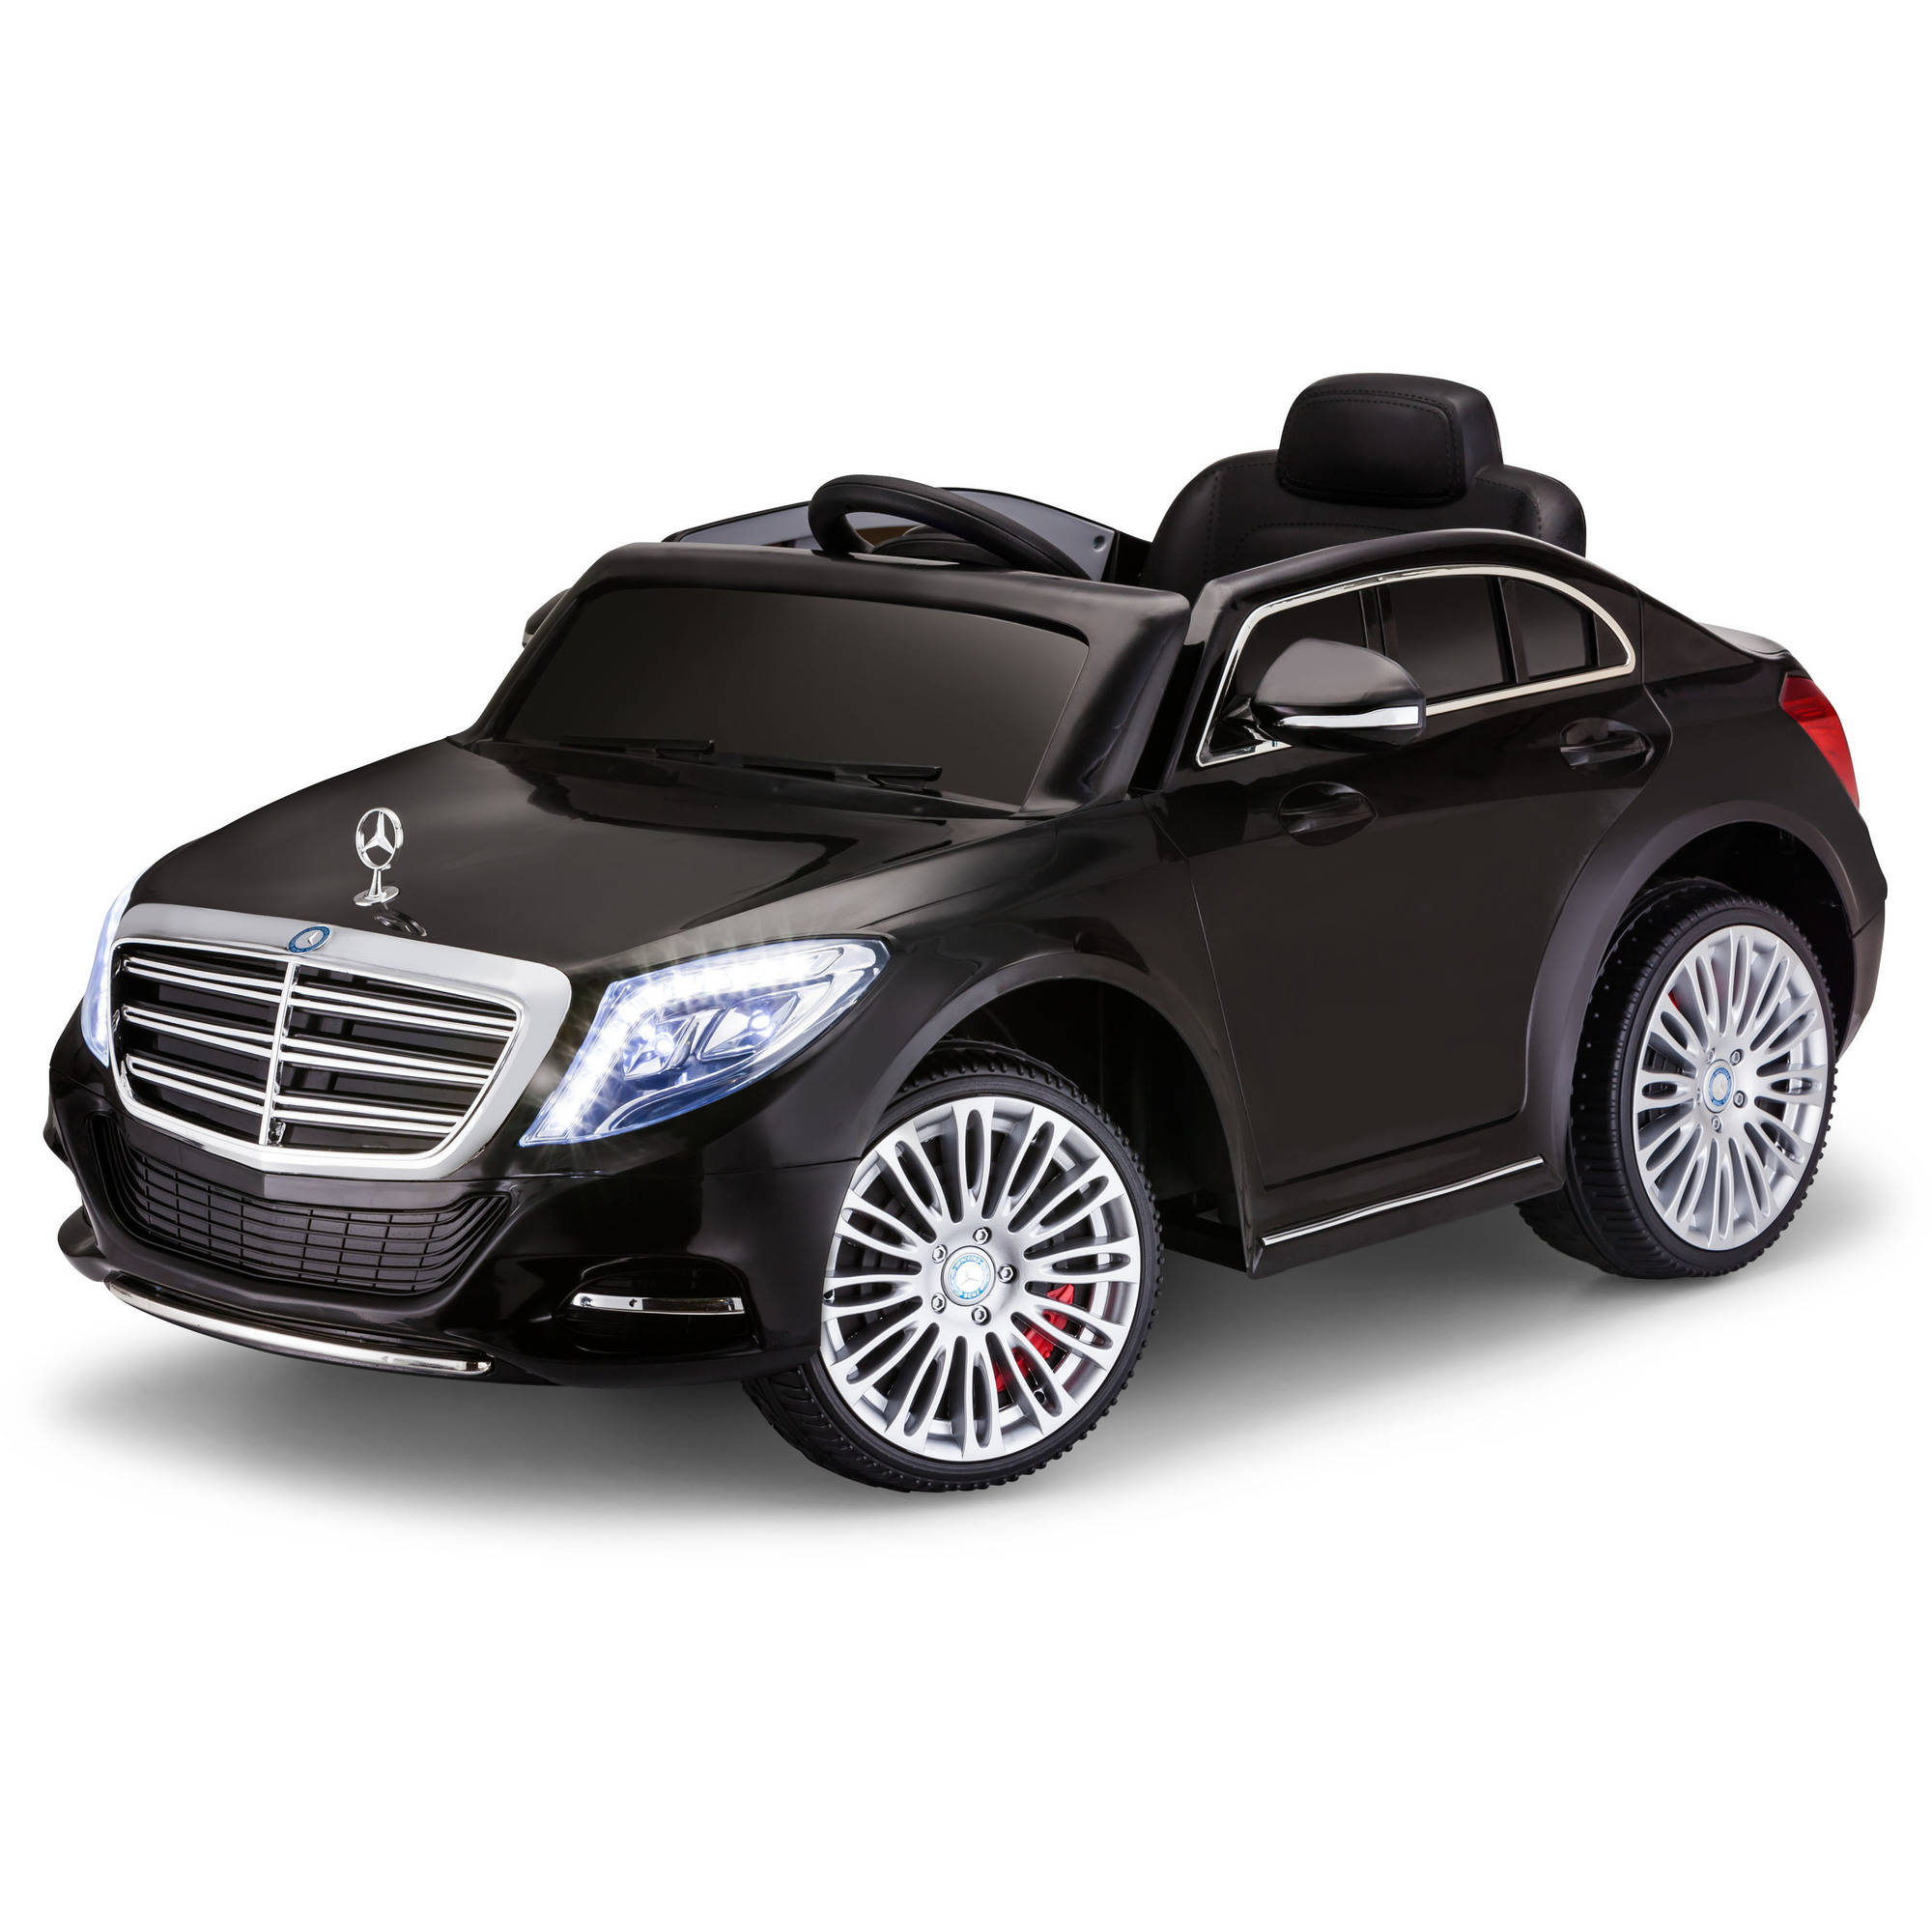 Kid Trax 6V Mercedes S600 Battery Powered Ride-On, Black